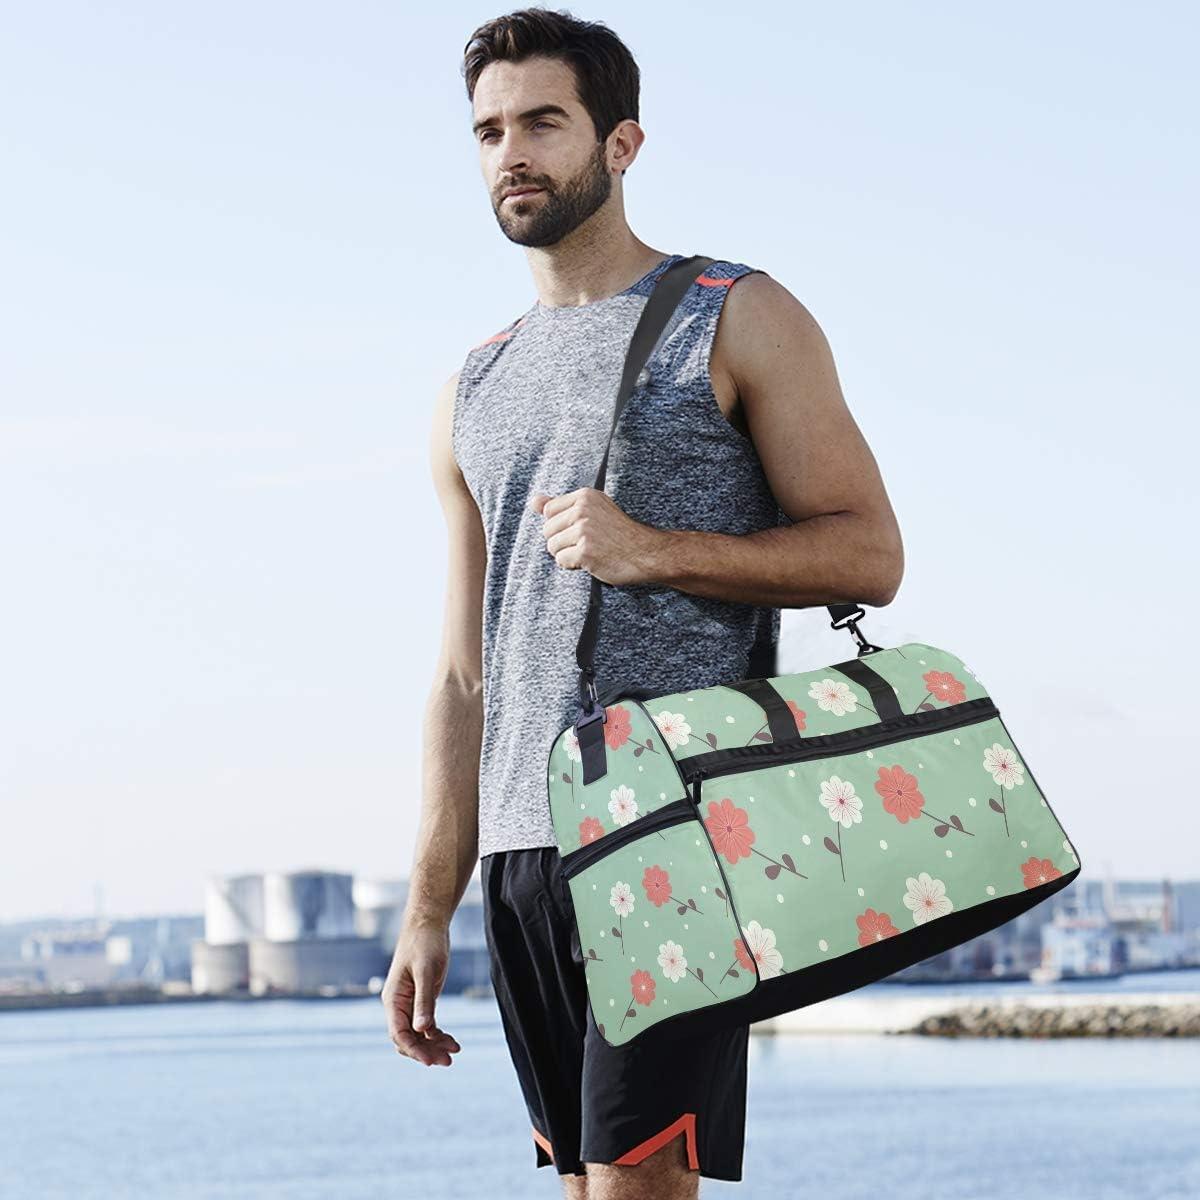 Travel Duffels Little Flower Duffle Bag Luggage Sports Gym for Women /& Men